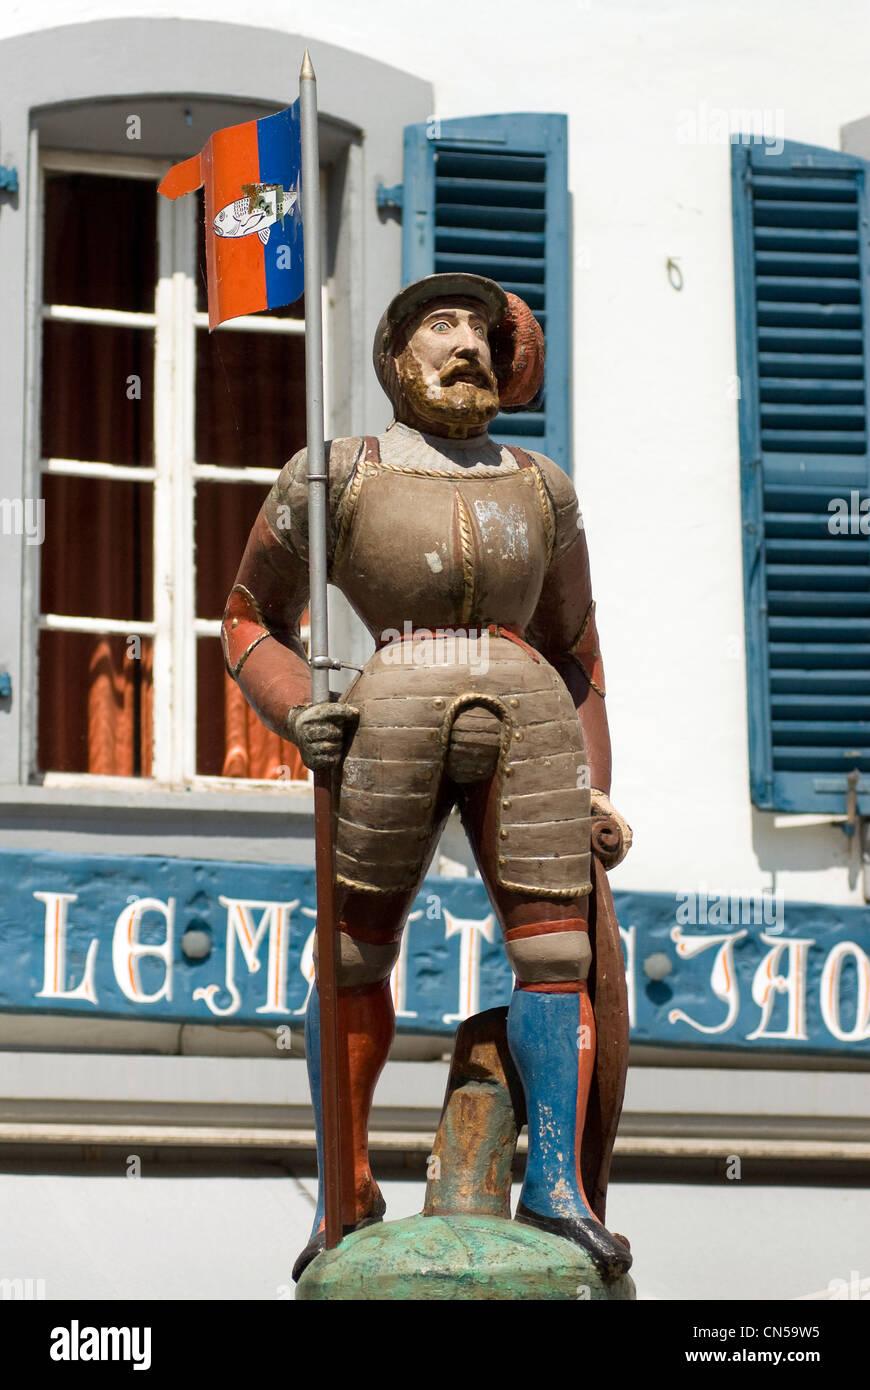 Switzerland, Canton of Vaud, Nyon, Le Maitre Jacques restaurant - Stock Image